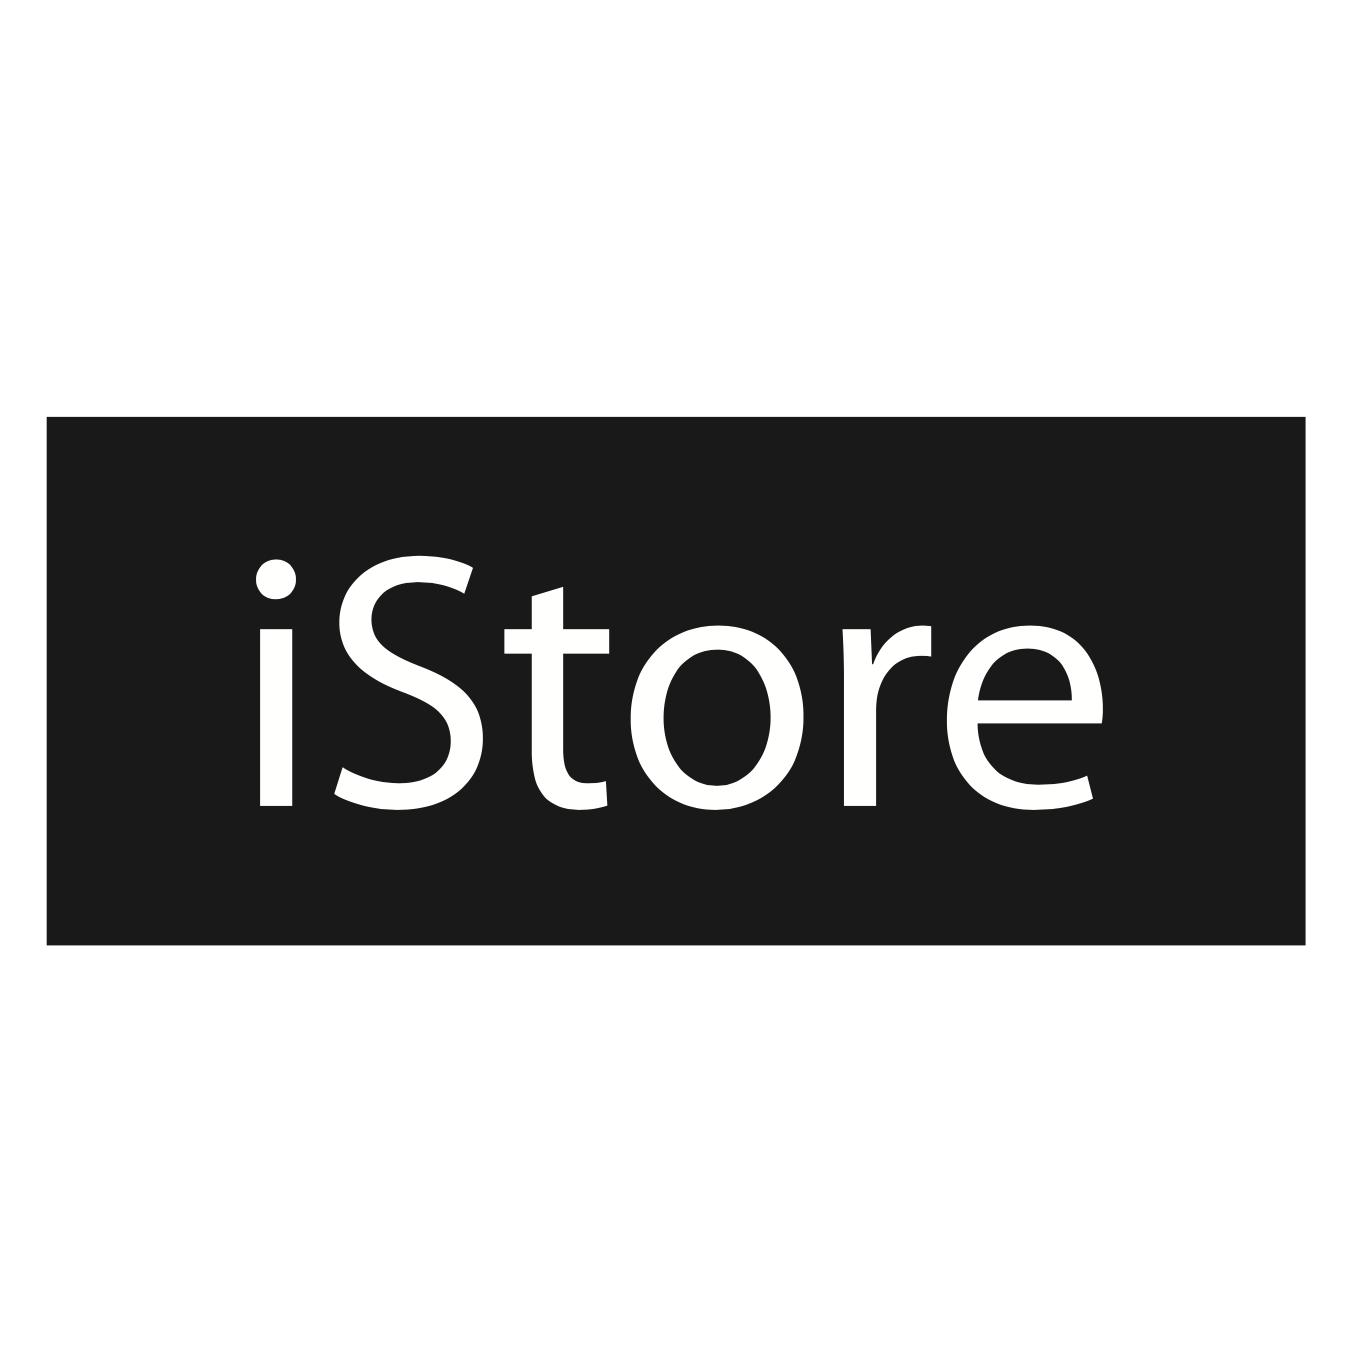 Smart Keyboard Folio for 12.9-inch iPad Pro (3rd Generation) - International English